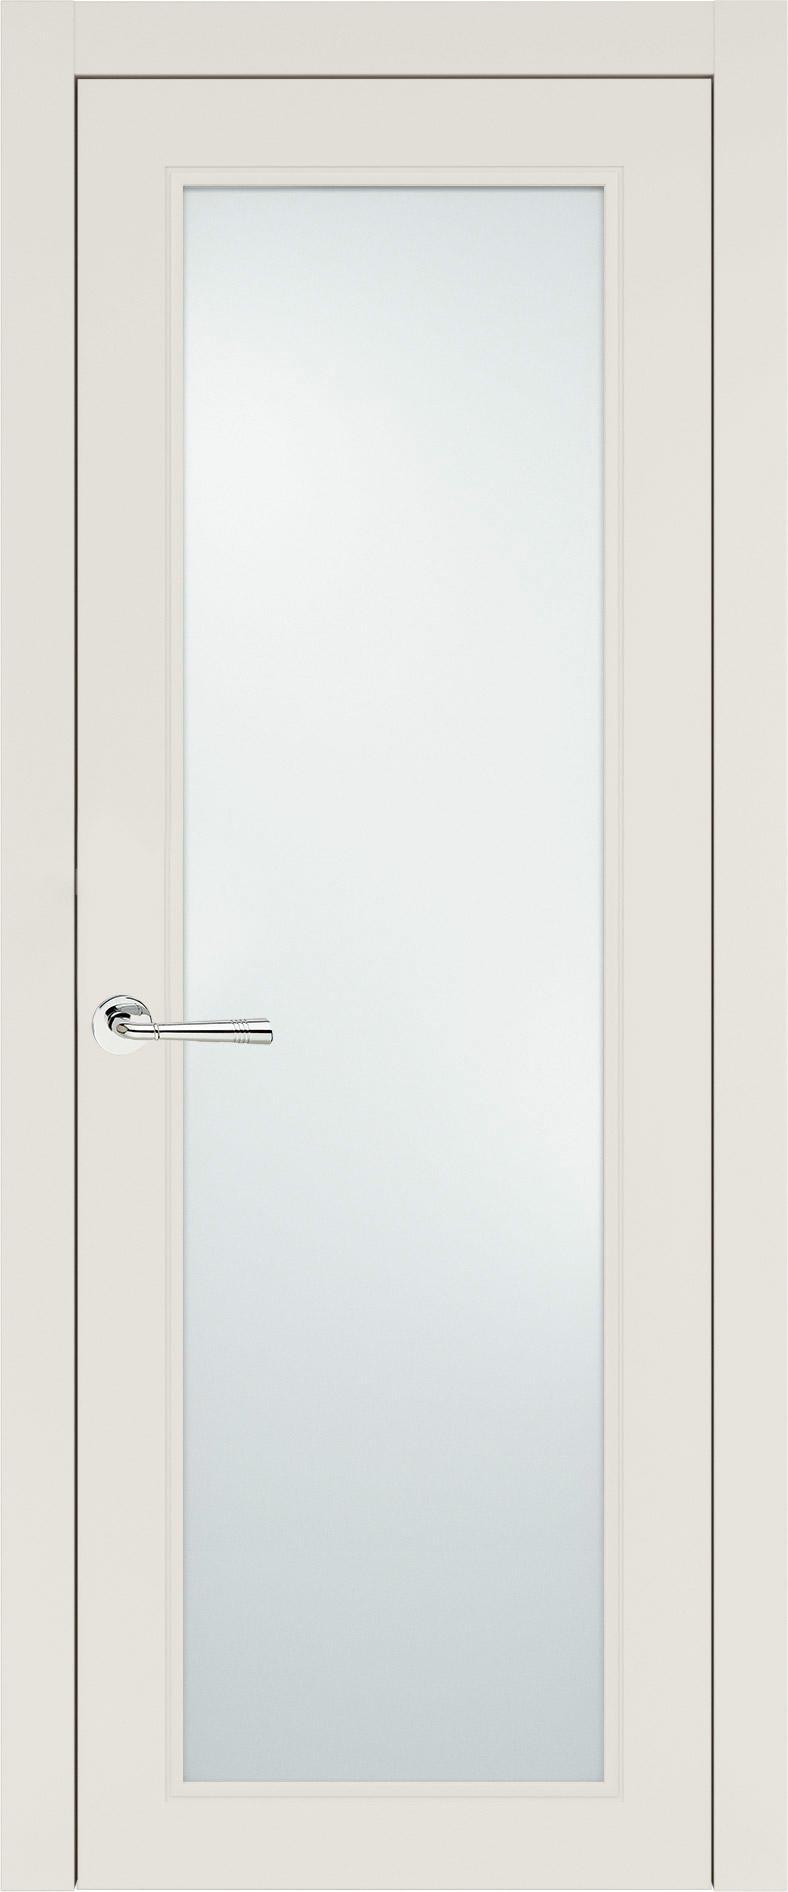 Domenica Neo Classic цвет - Бежевая эмаль (RAL 9010) Со стеклом (ДО)